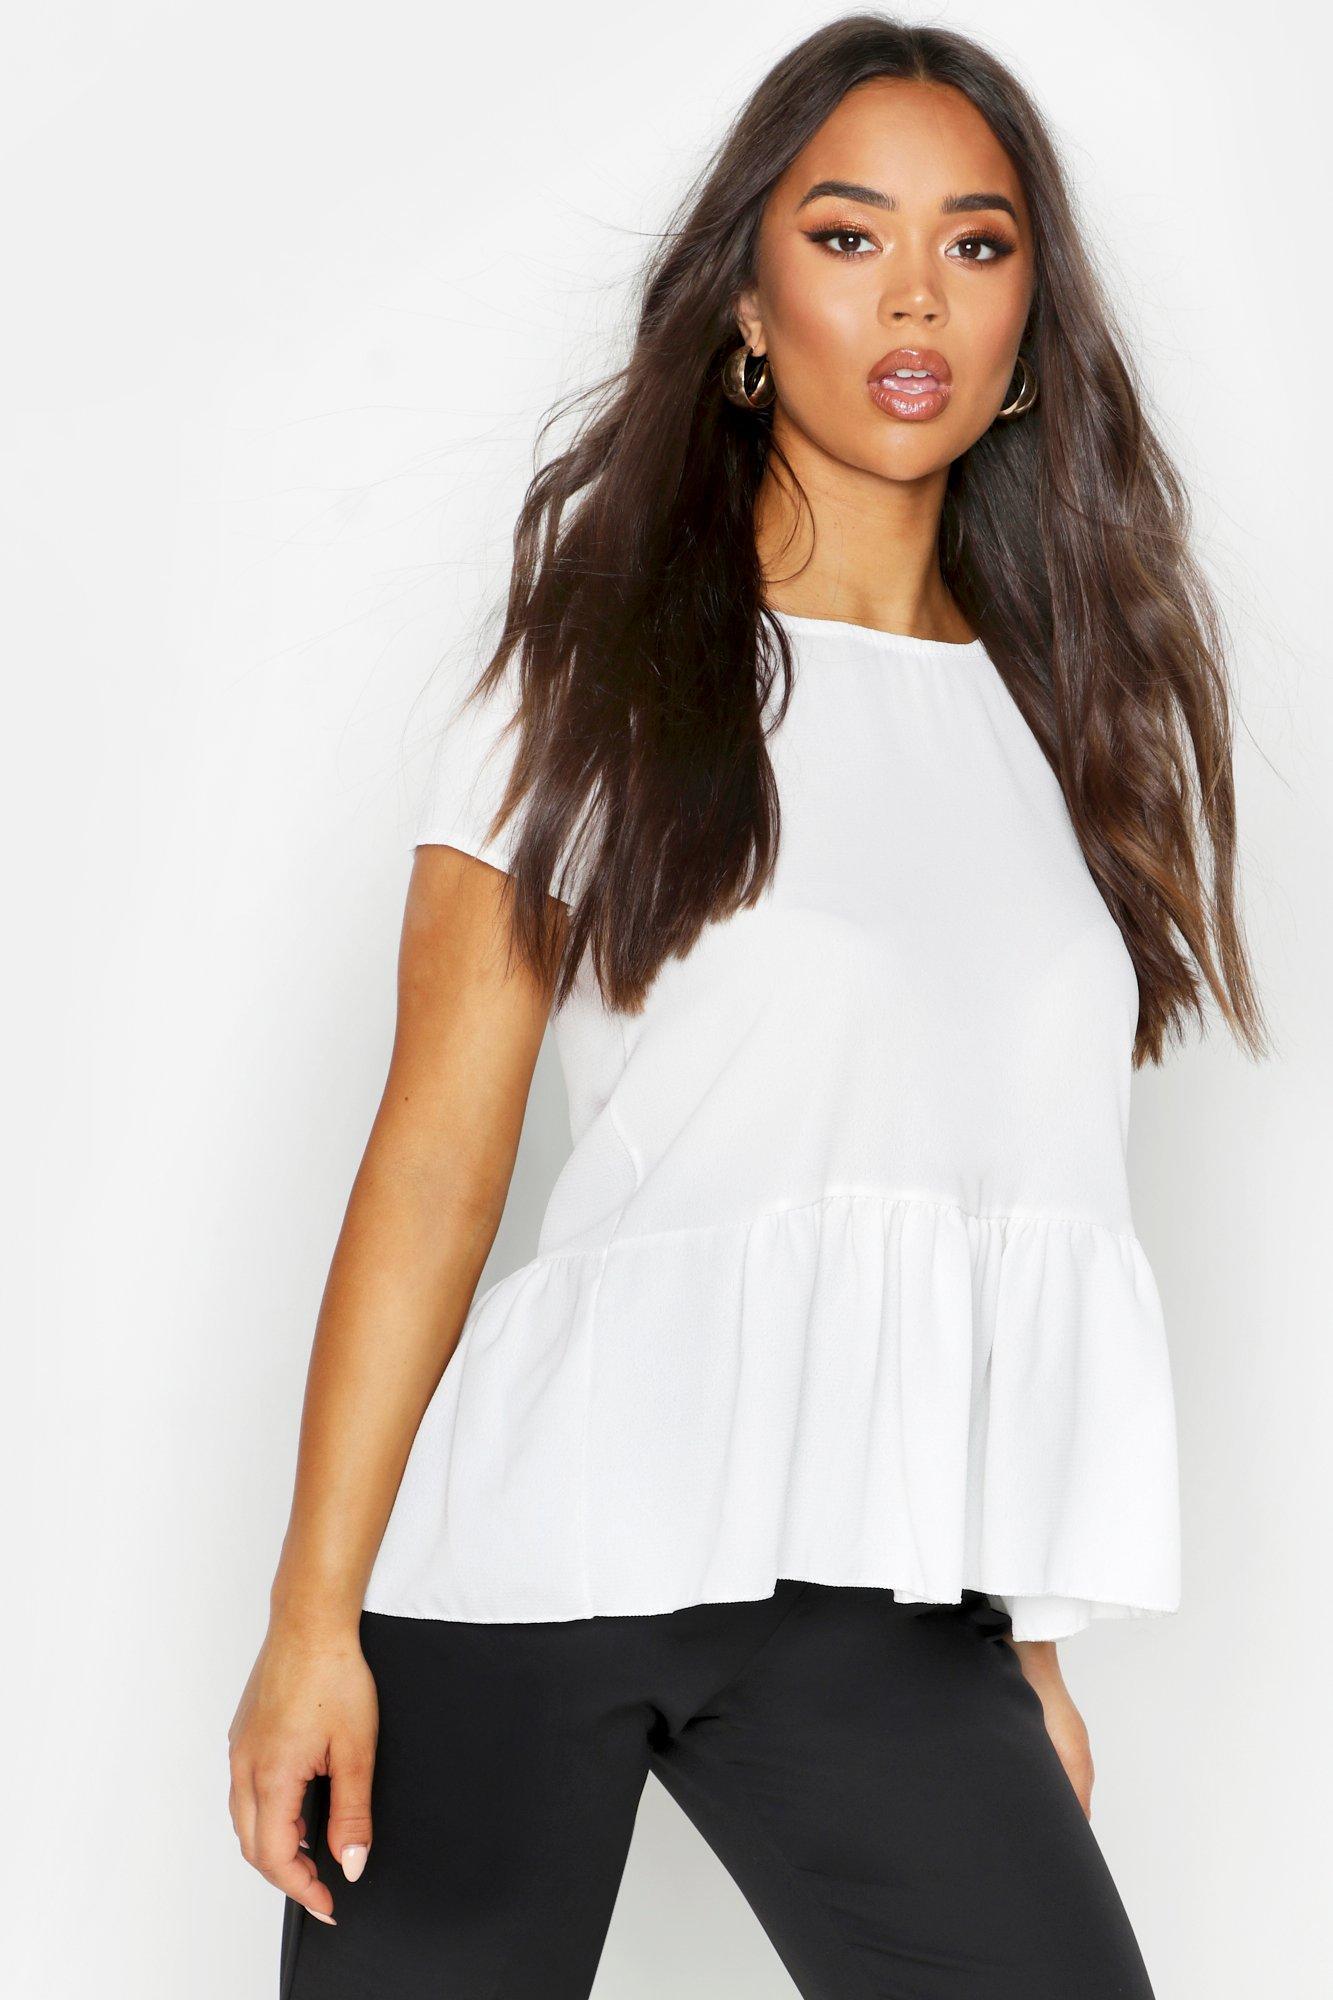 Womens Kurzärmelige Bluse mit Schößchensaum - Weiß - 38, Weiß - Boohoo.com